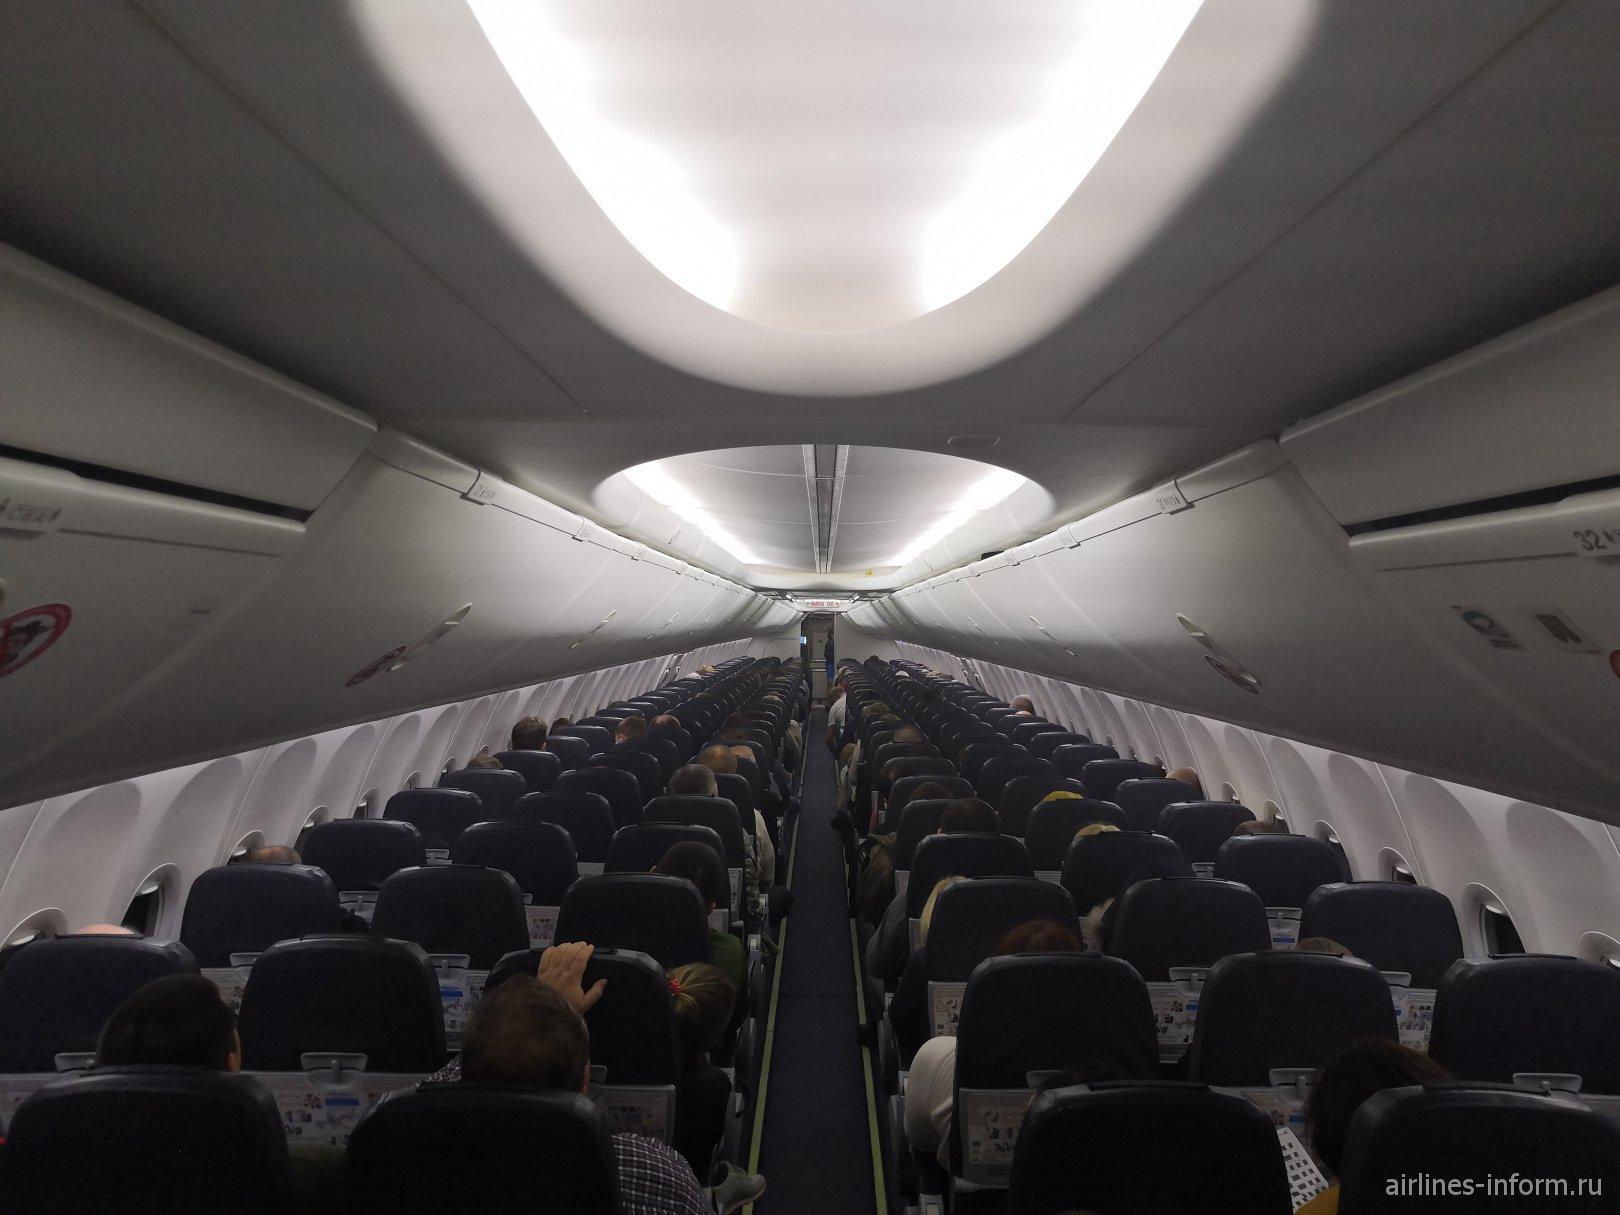 Пассажирский салон самолета Боинг-737-800 авиакомпании